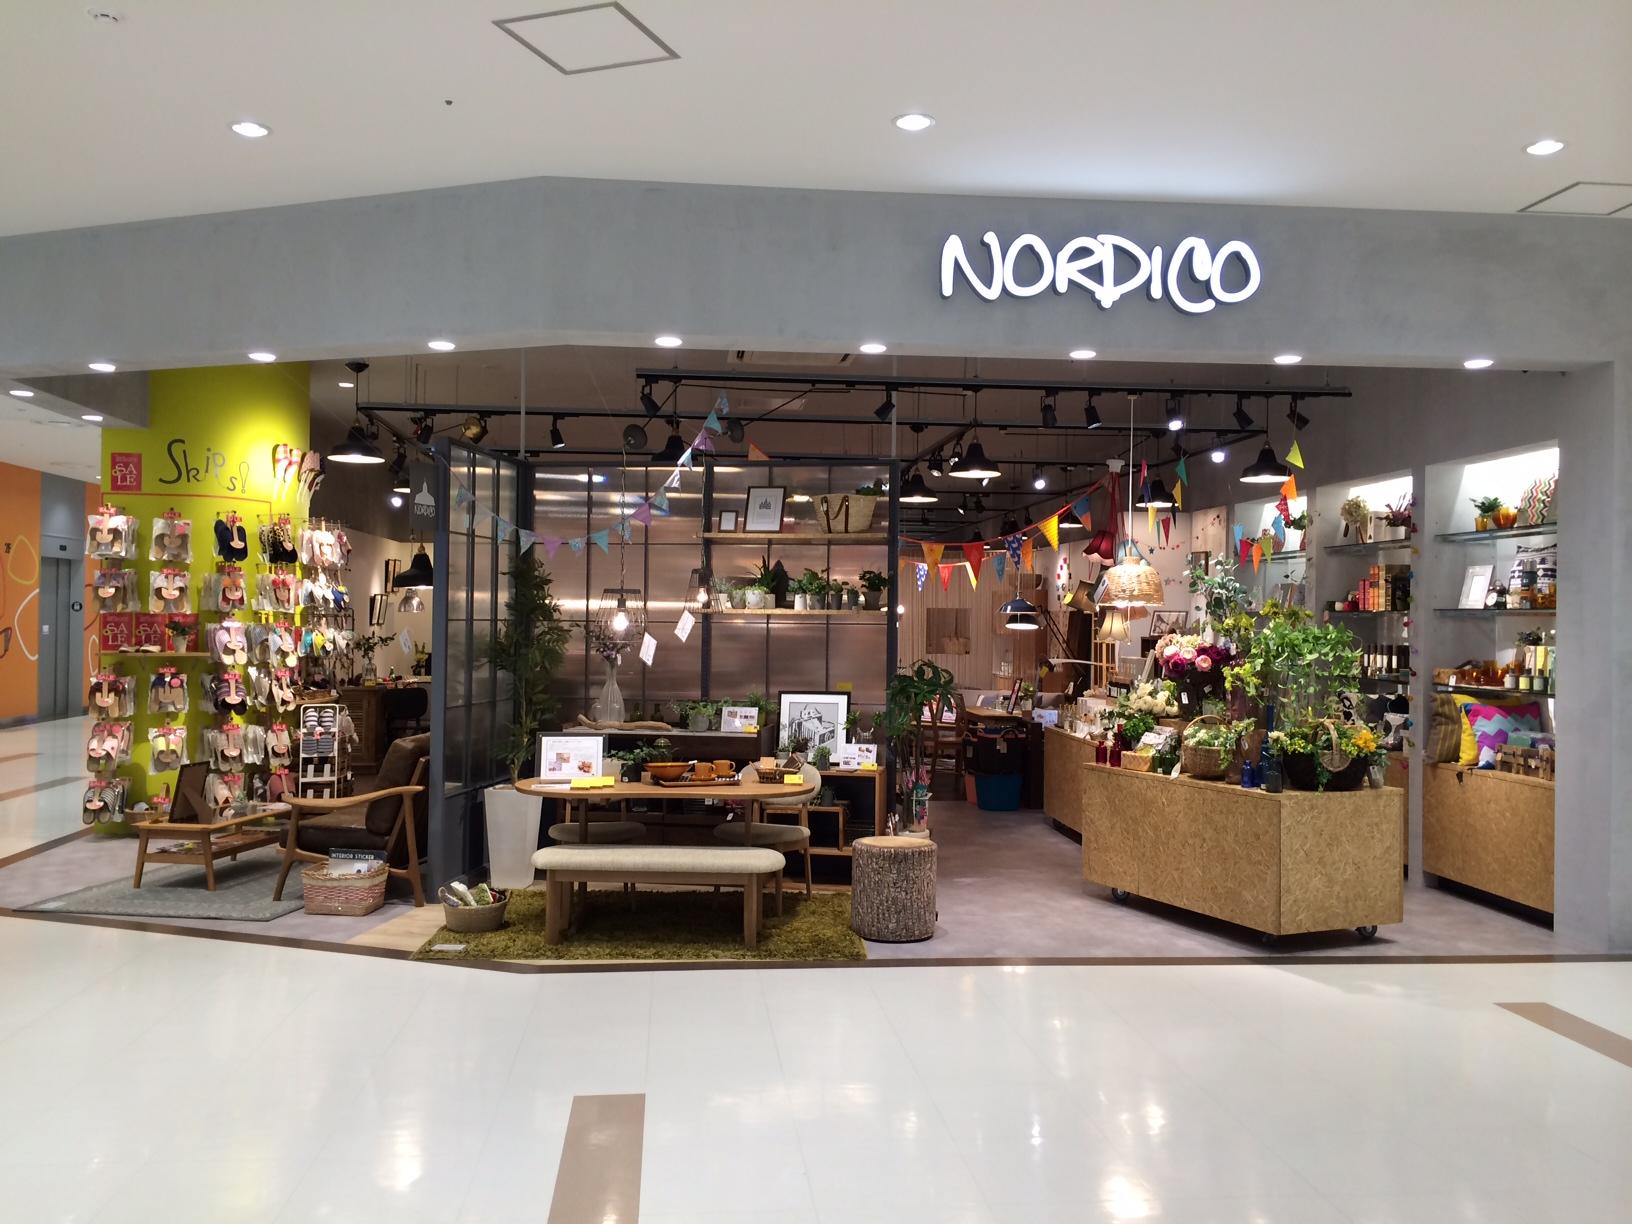 living house nordico (ノルディコ) 船橋店」ブログ スタートします